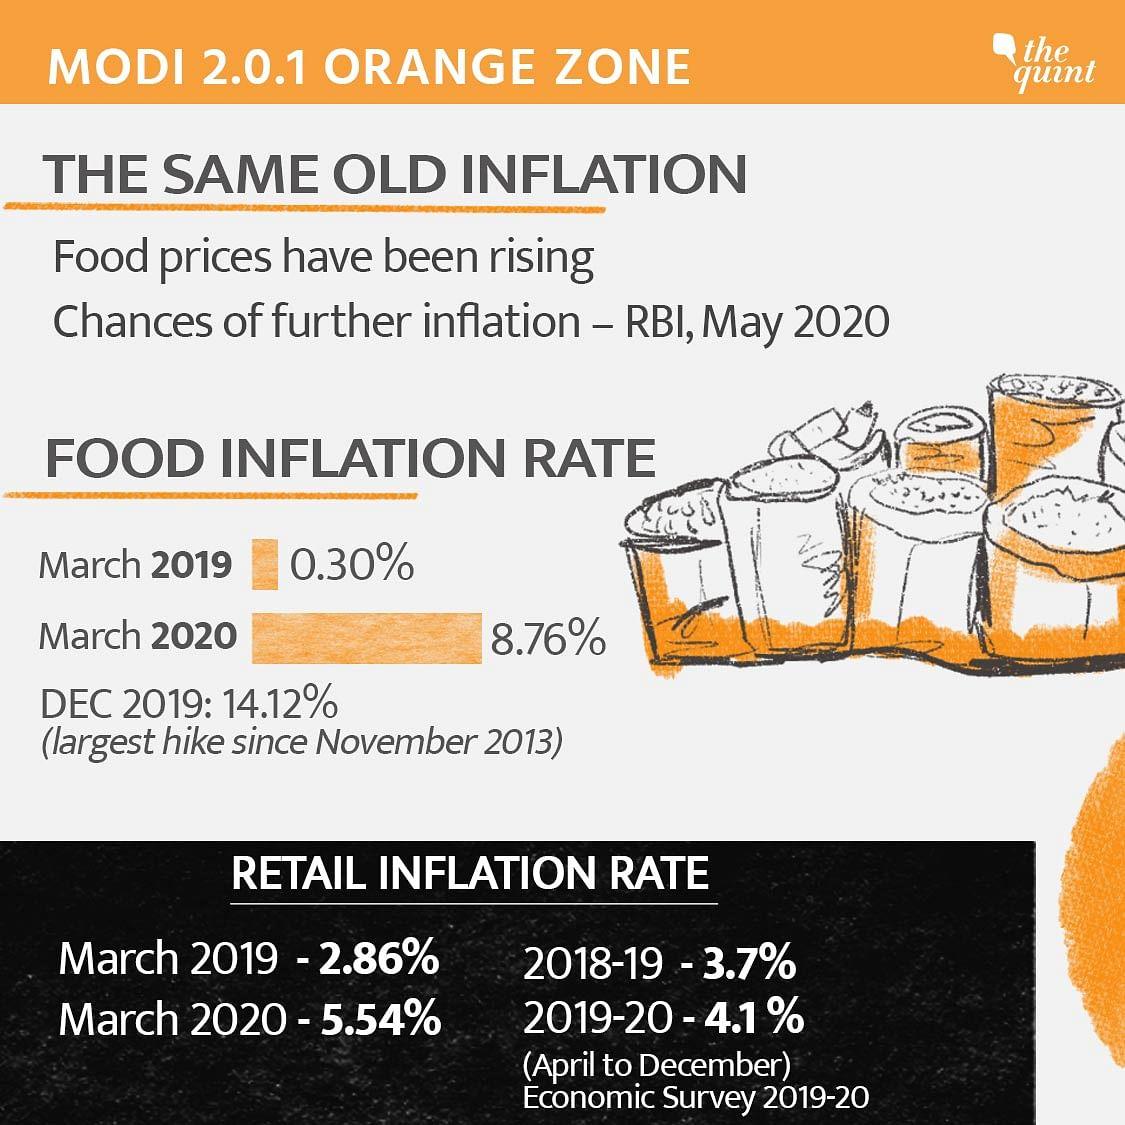 Orange Zone - The same old inflation.